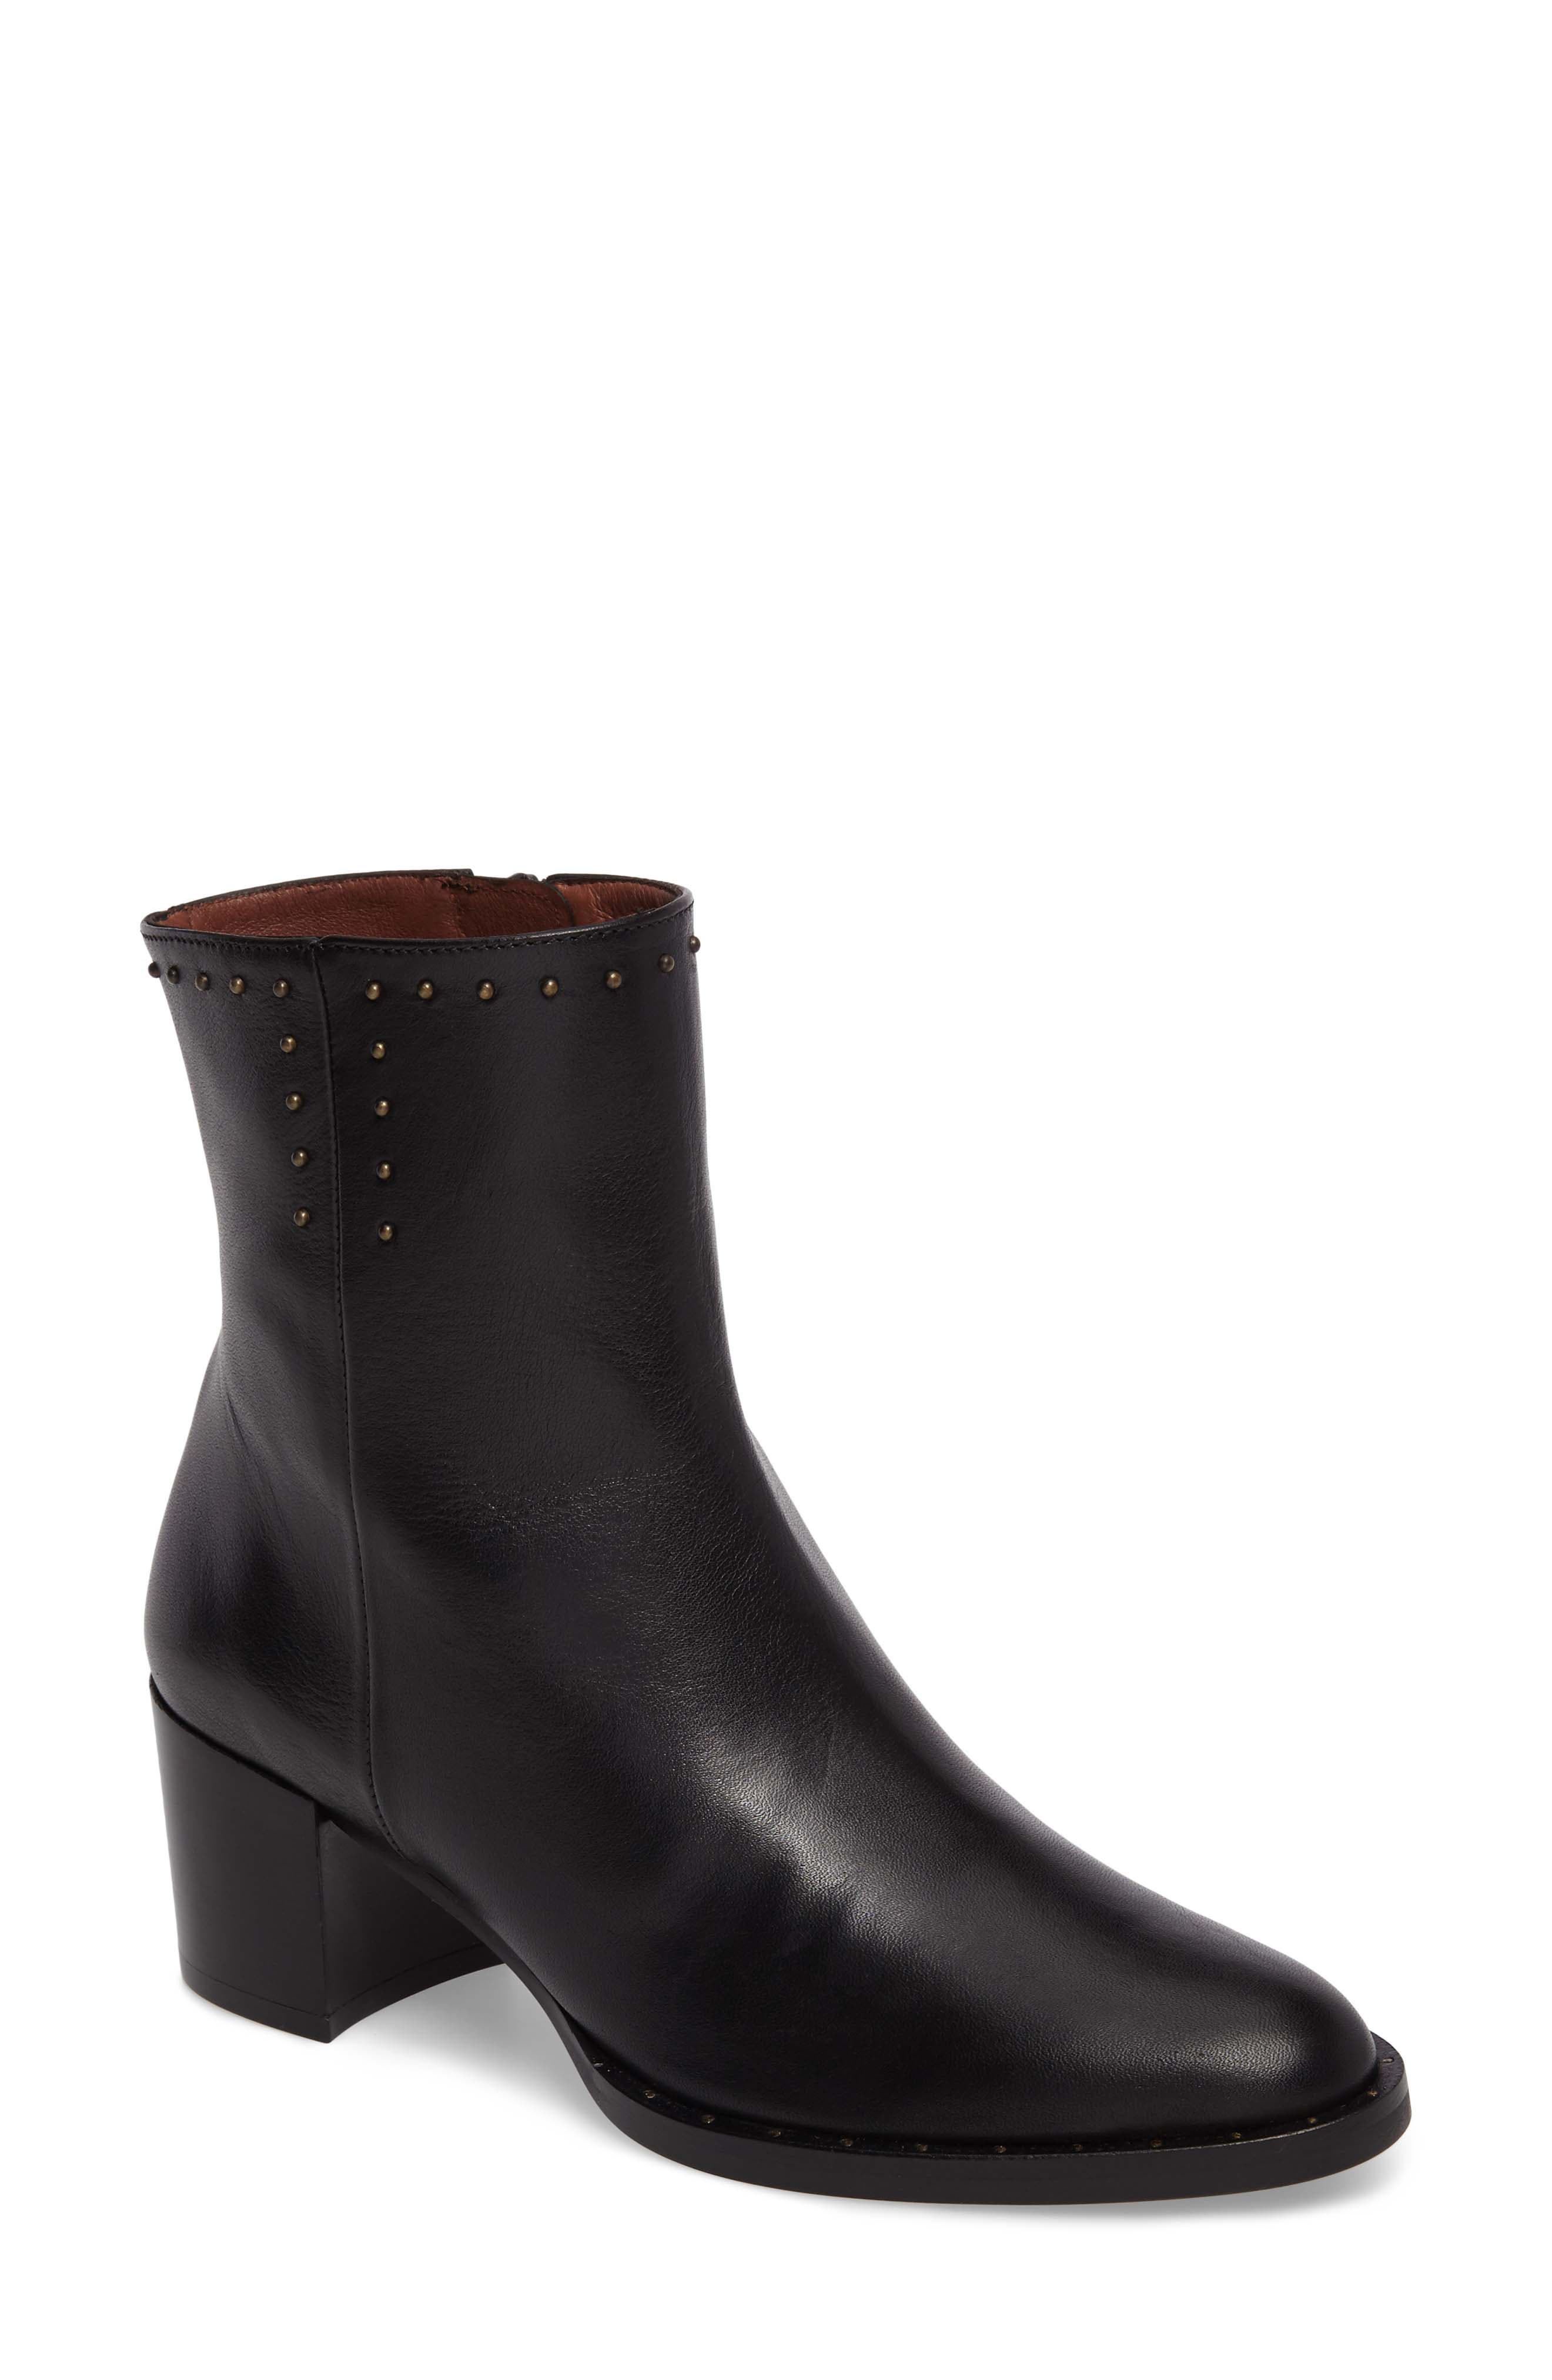 239aabdb80a59 Hispanitas Sale, Women's Shoes